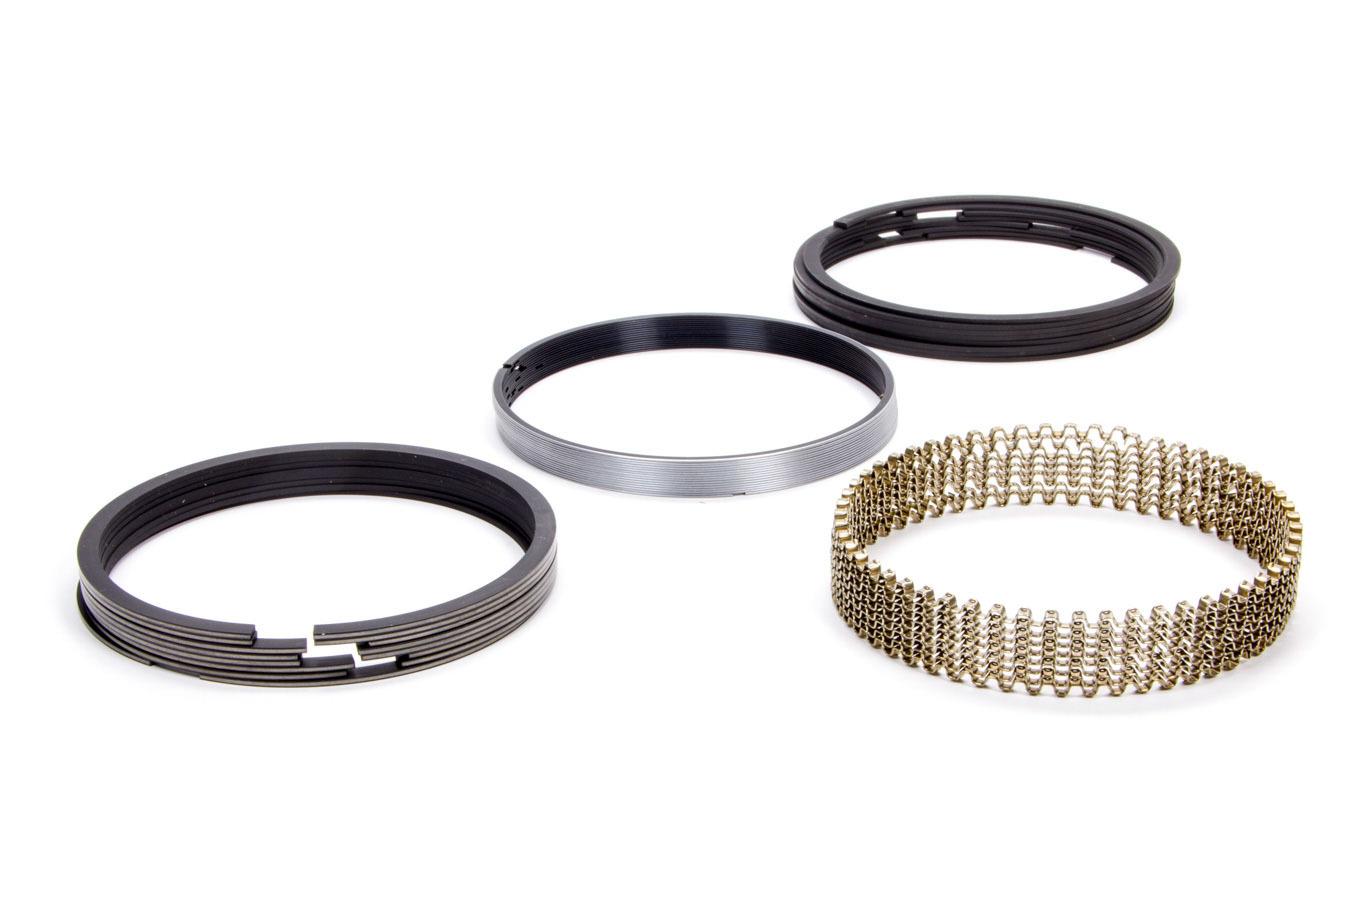 Hastings Piston Ring Set 4.000 1.5 1.5 4.0mm